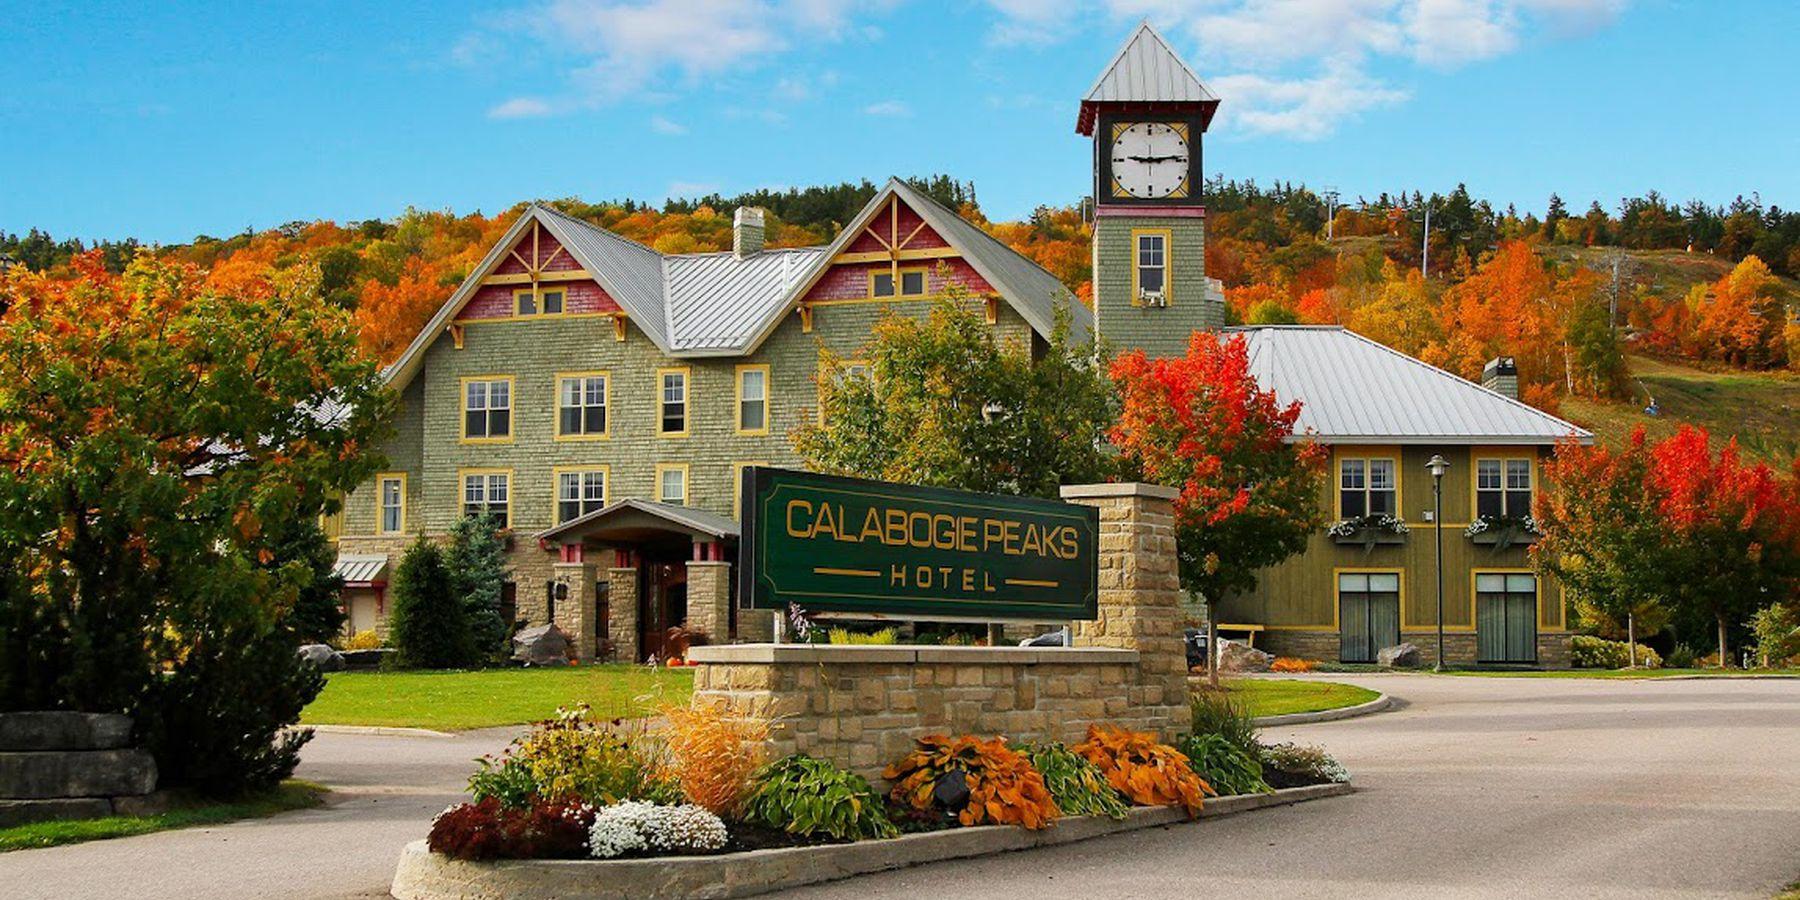 Calabogie Peaks Resort - 1